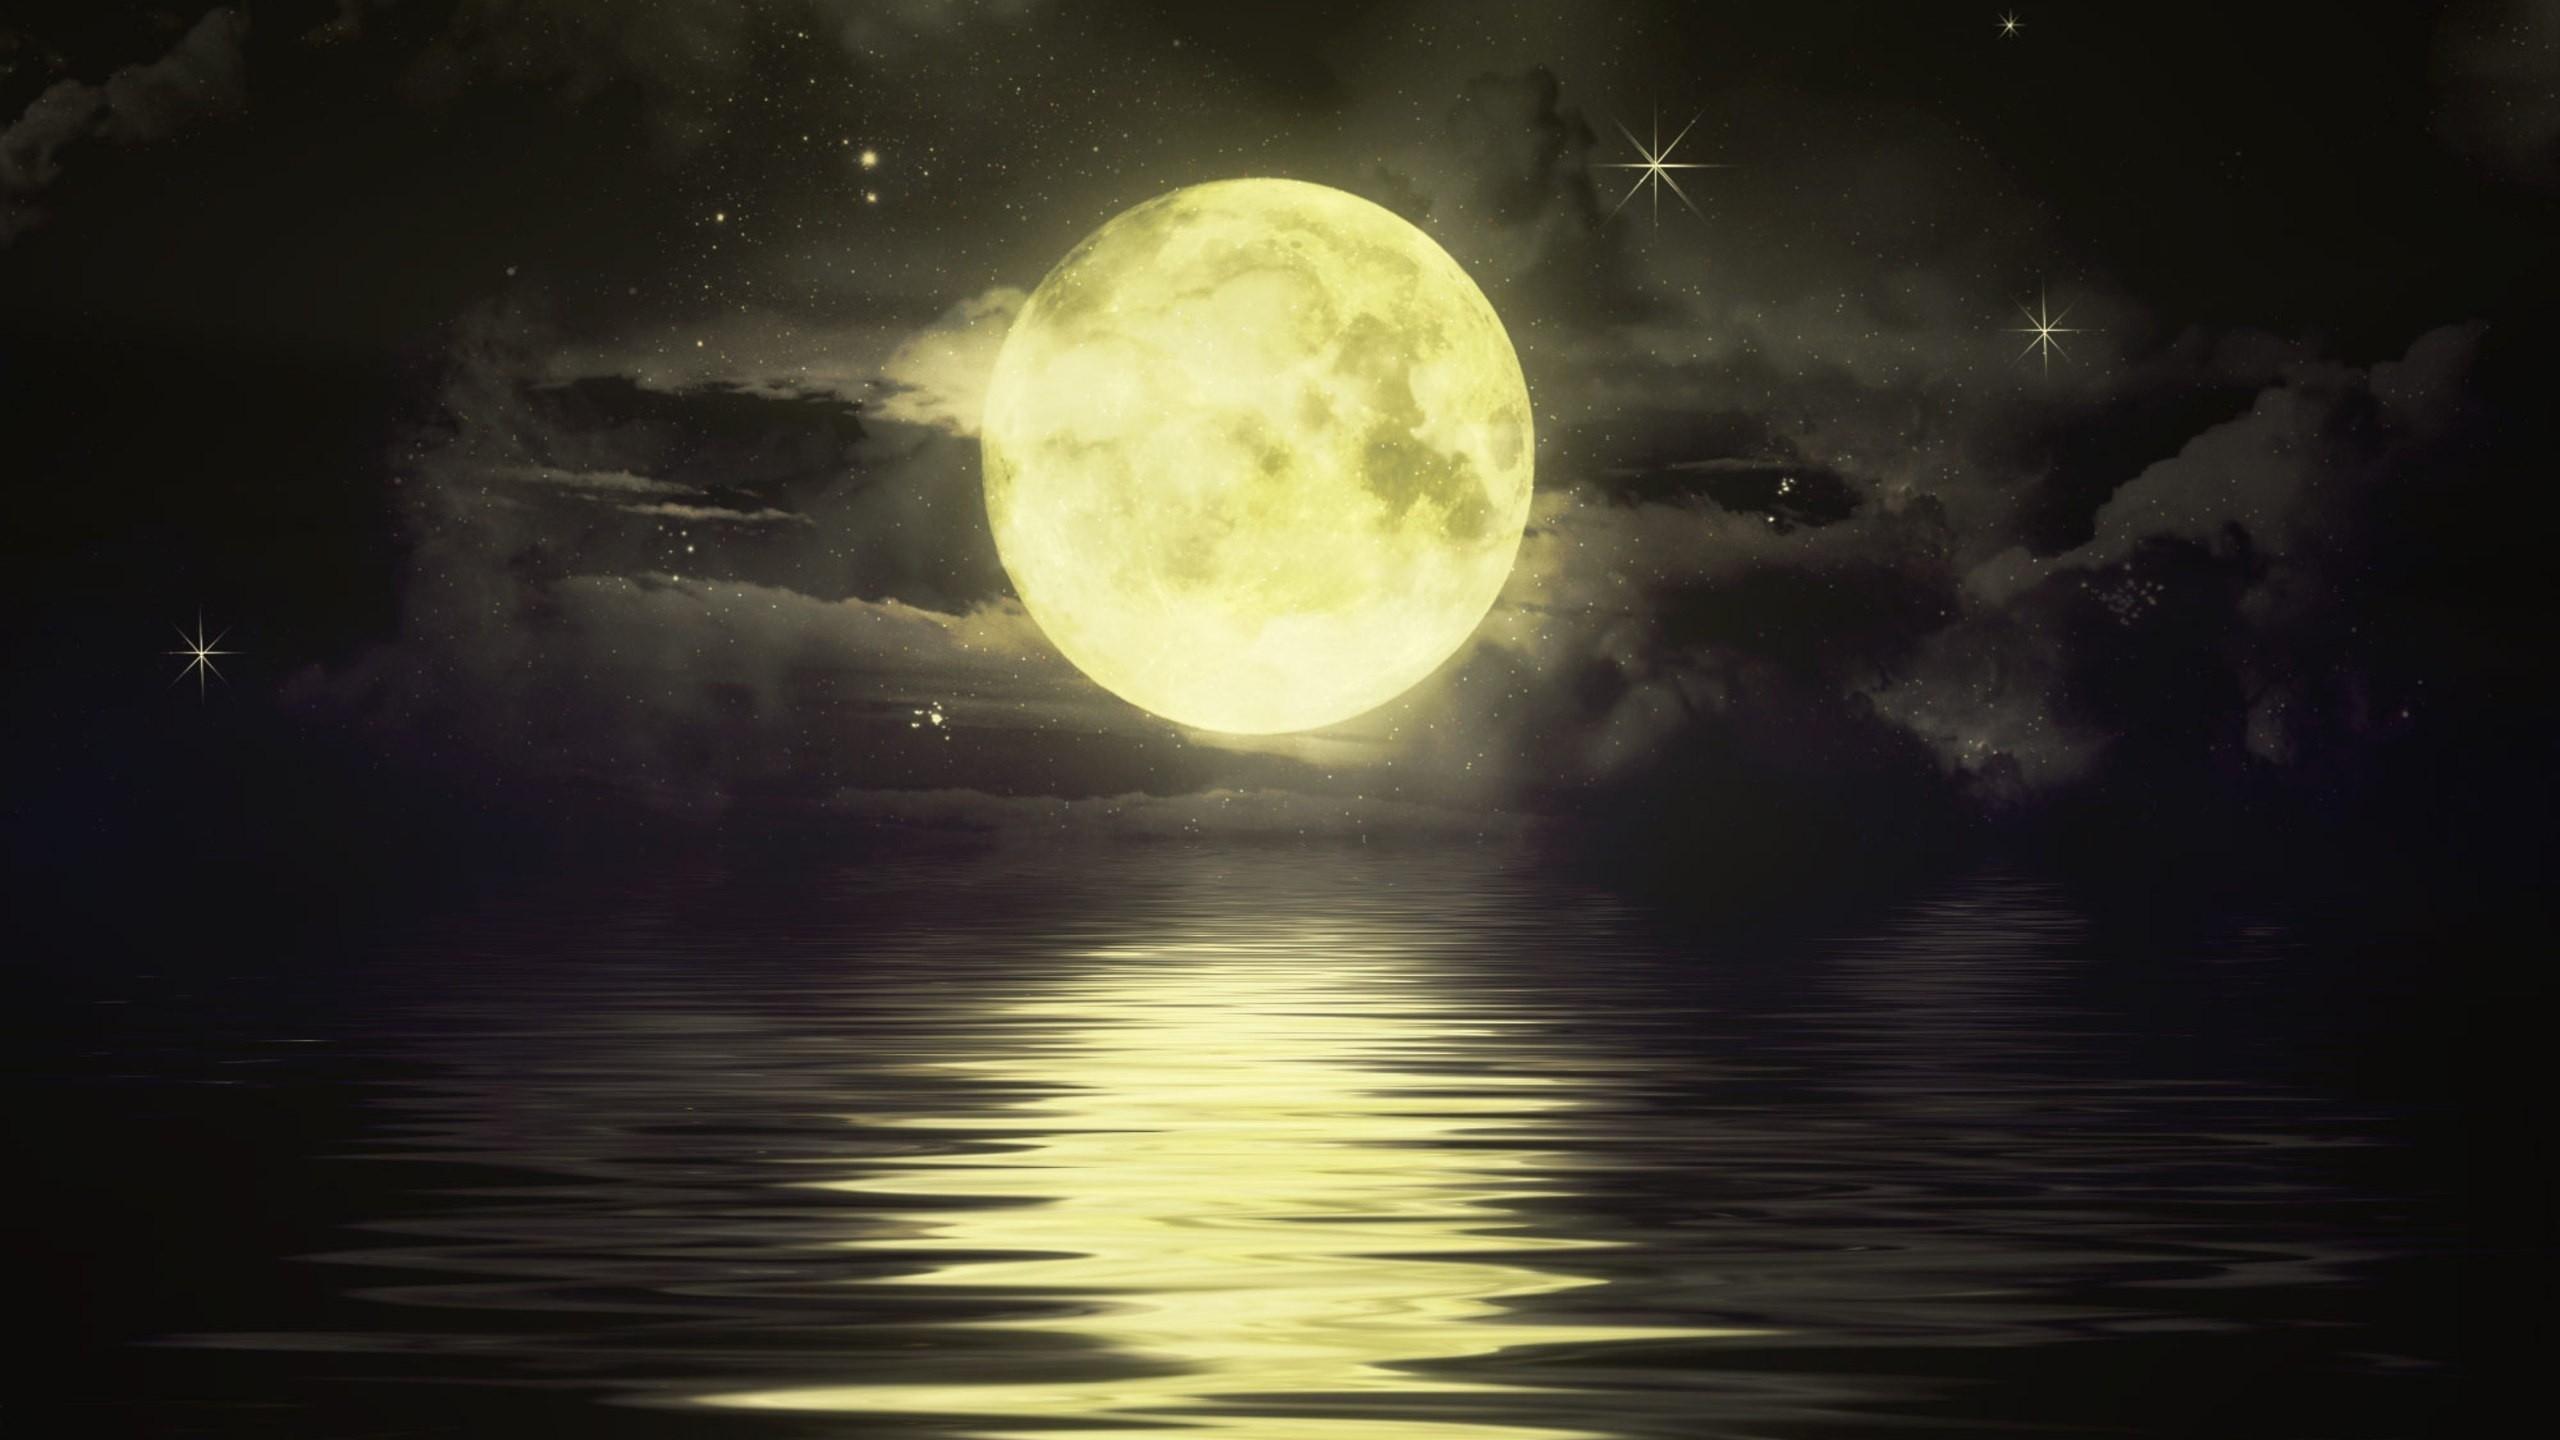 Night Sky Moon Hd